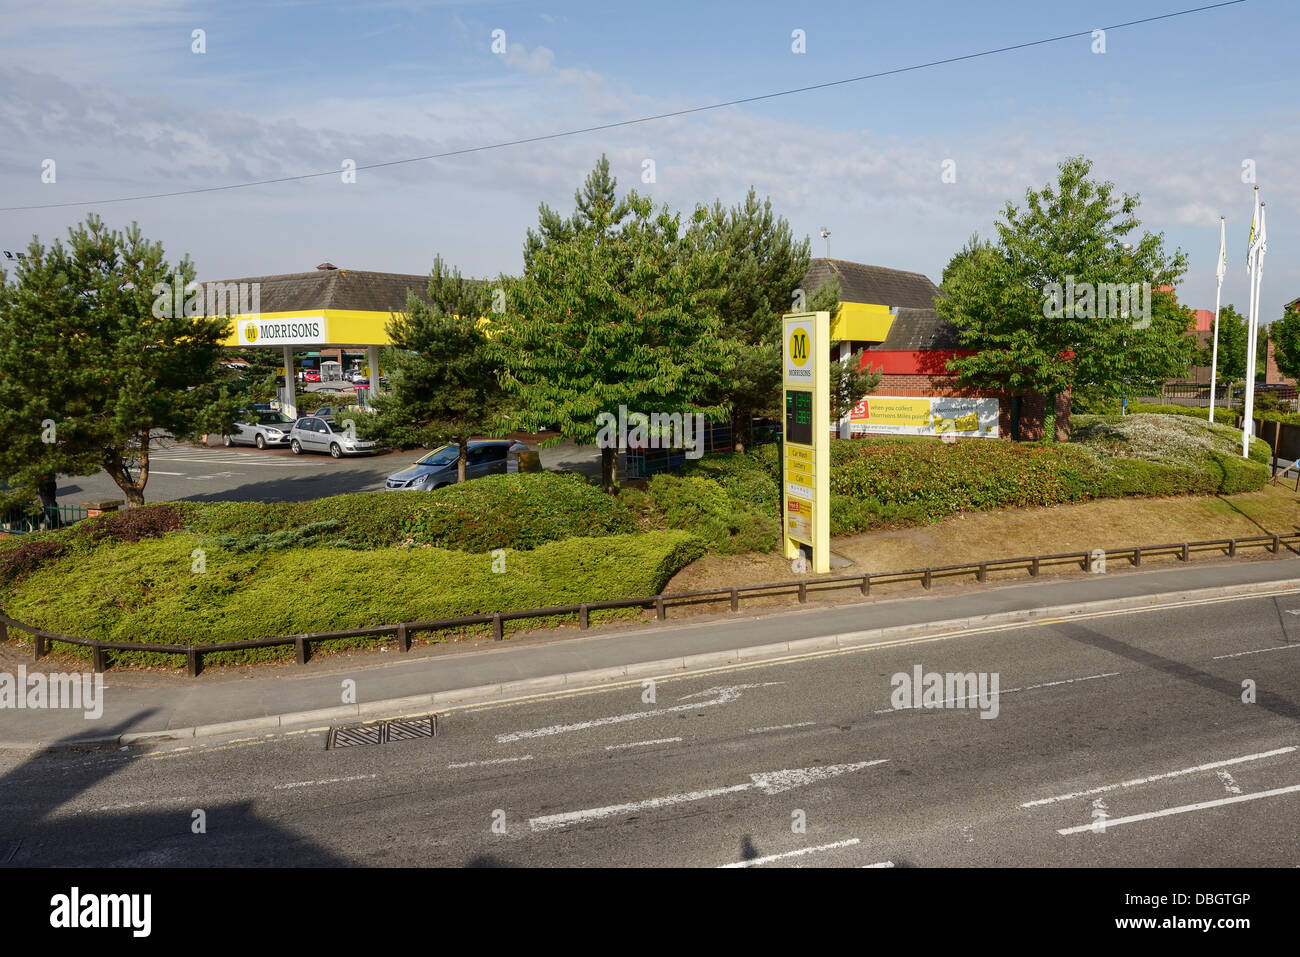 Morrisons petrol station in Stockton Heath Warrington UK - Stock Image